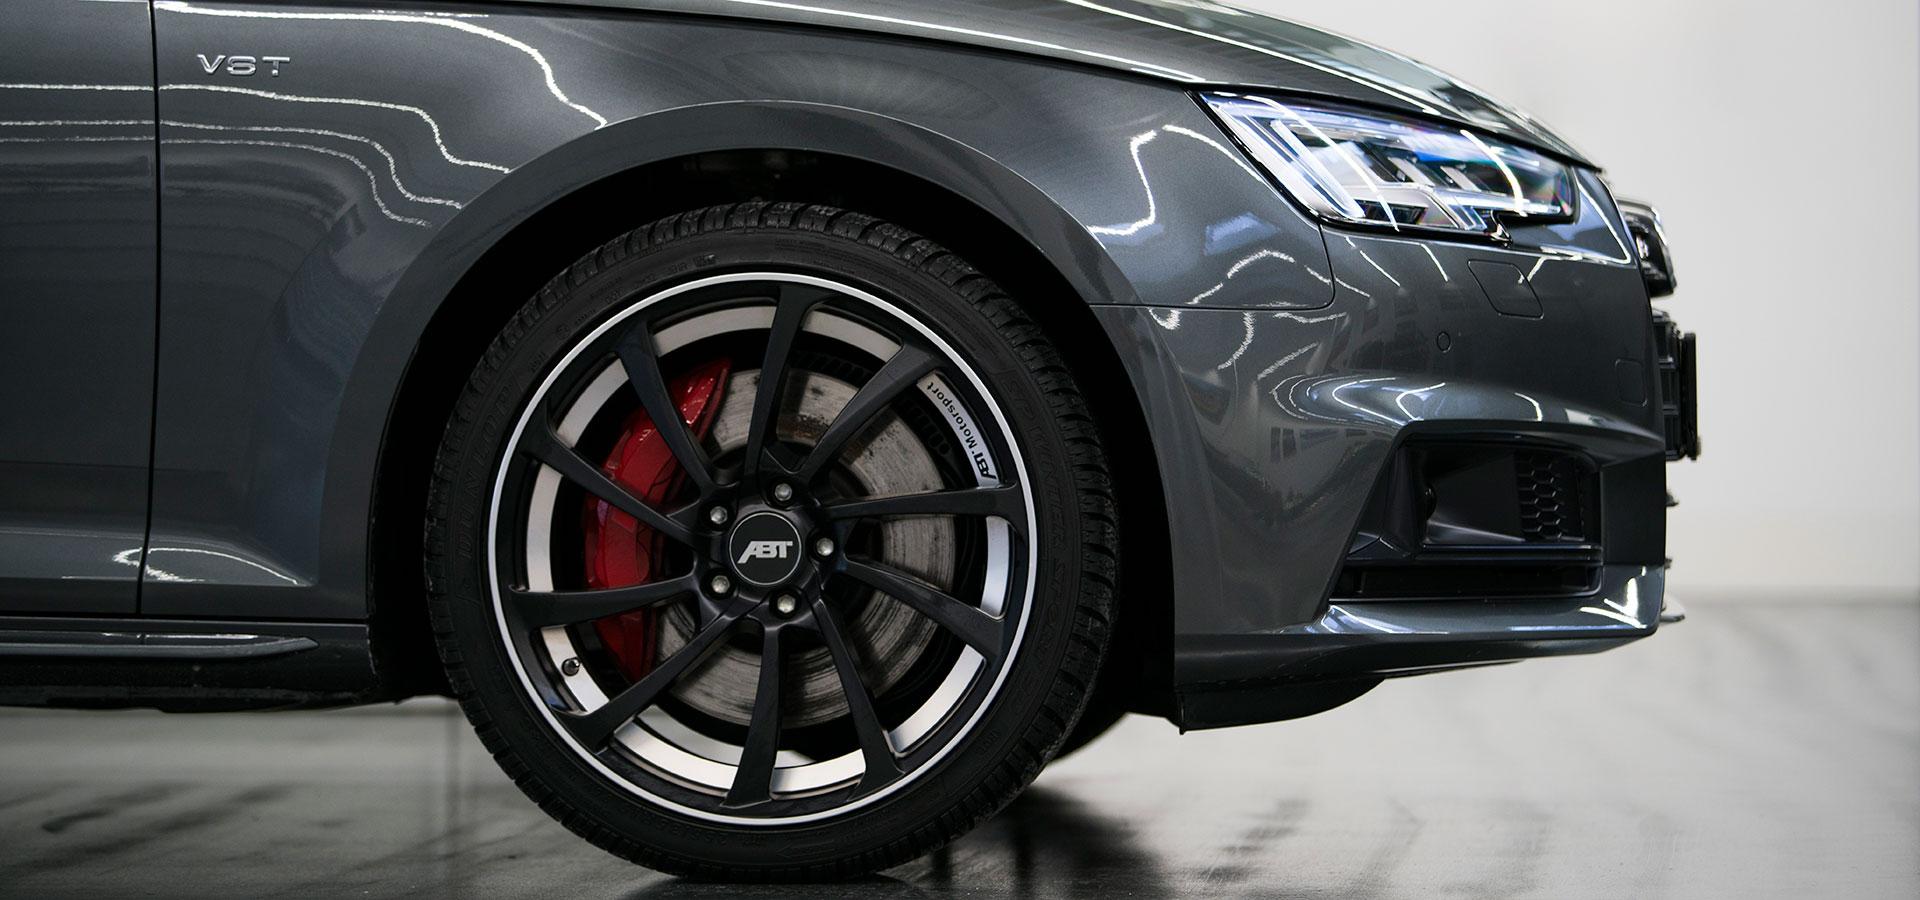 Audi S4 Abt Sportsline